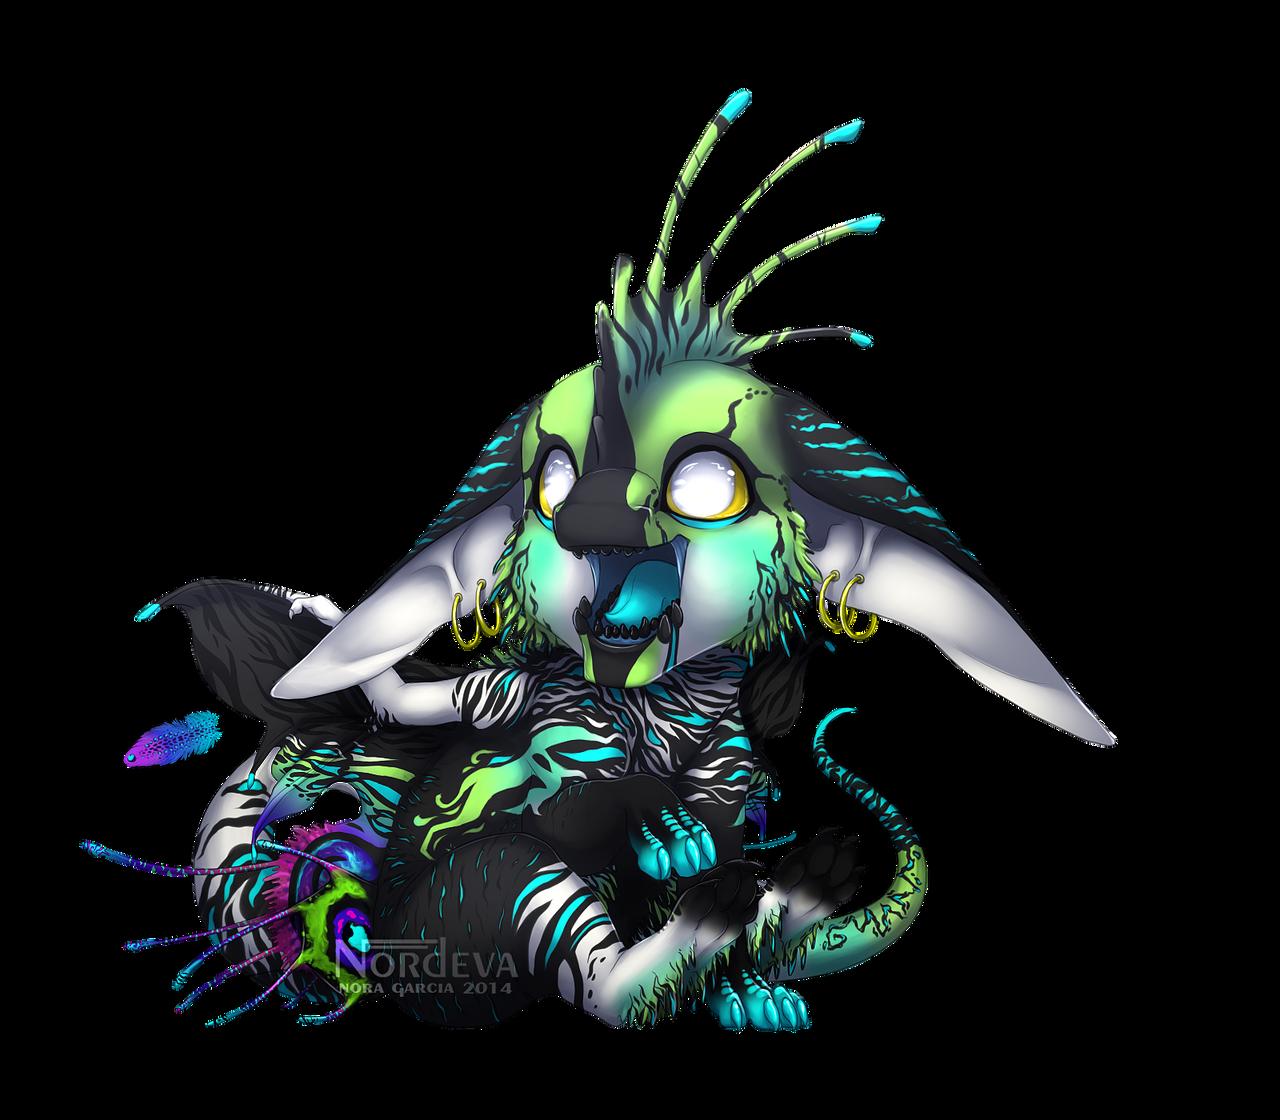 GlowyNeliana332's Profile Picture